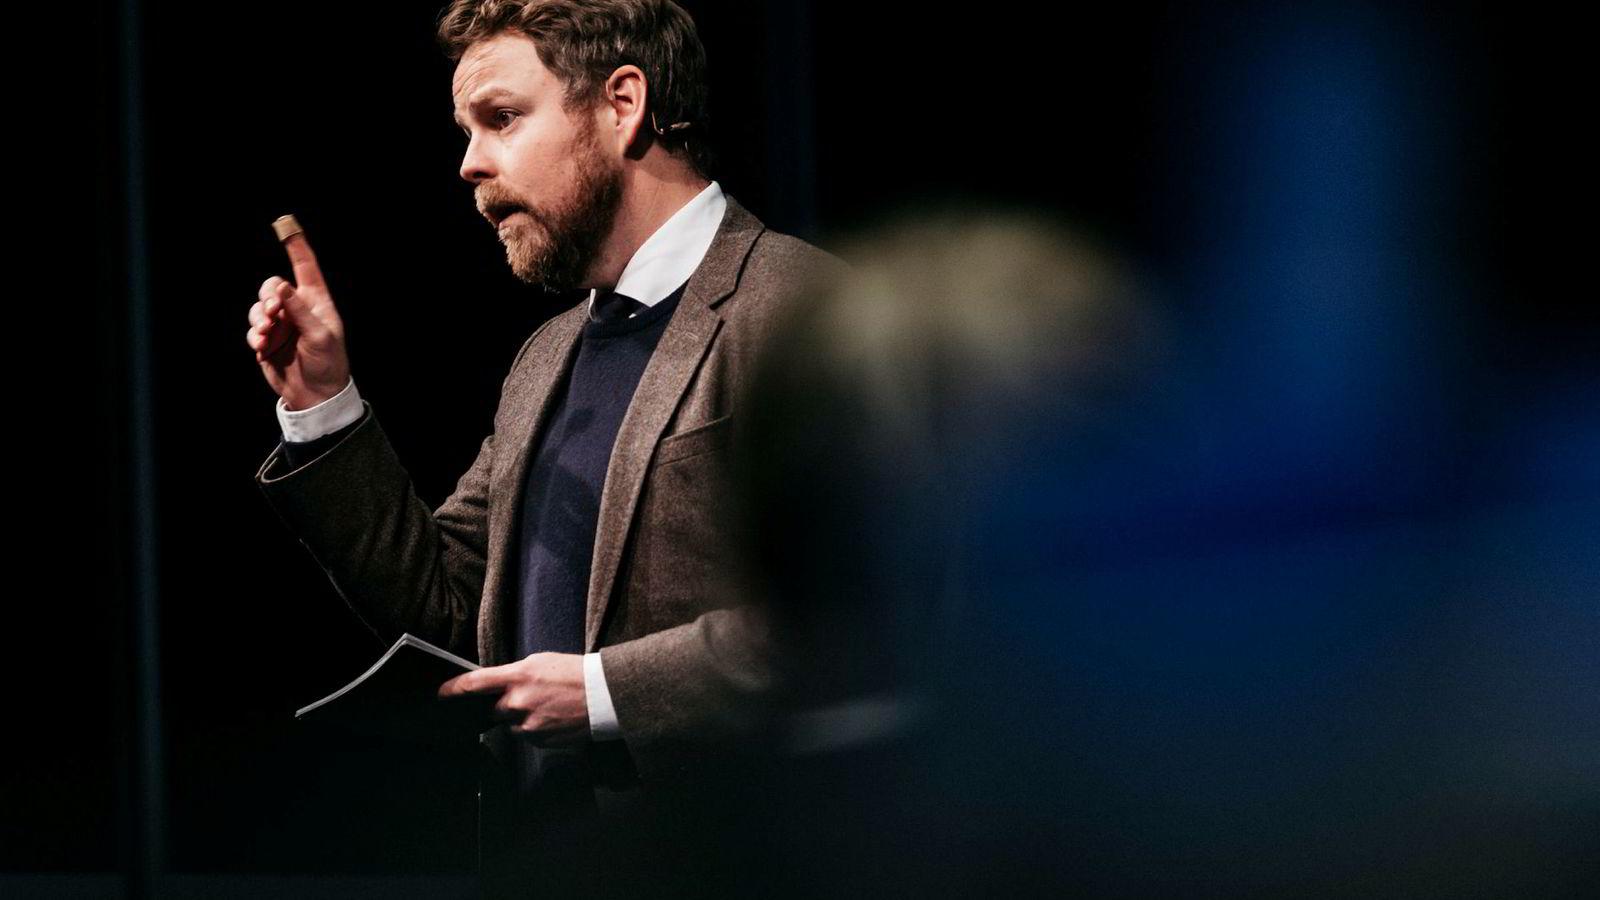 Næringsminister Torbjørn Røe Isaksen svarer på kritikken fra Else Bugge Fougner.